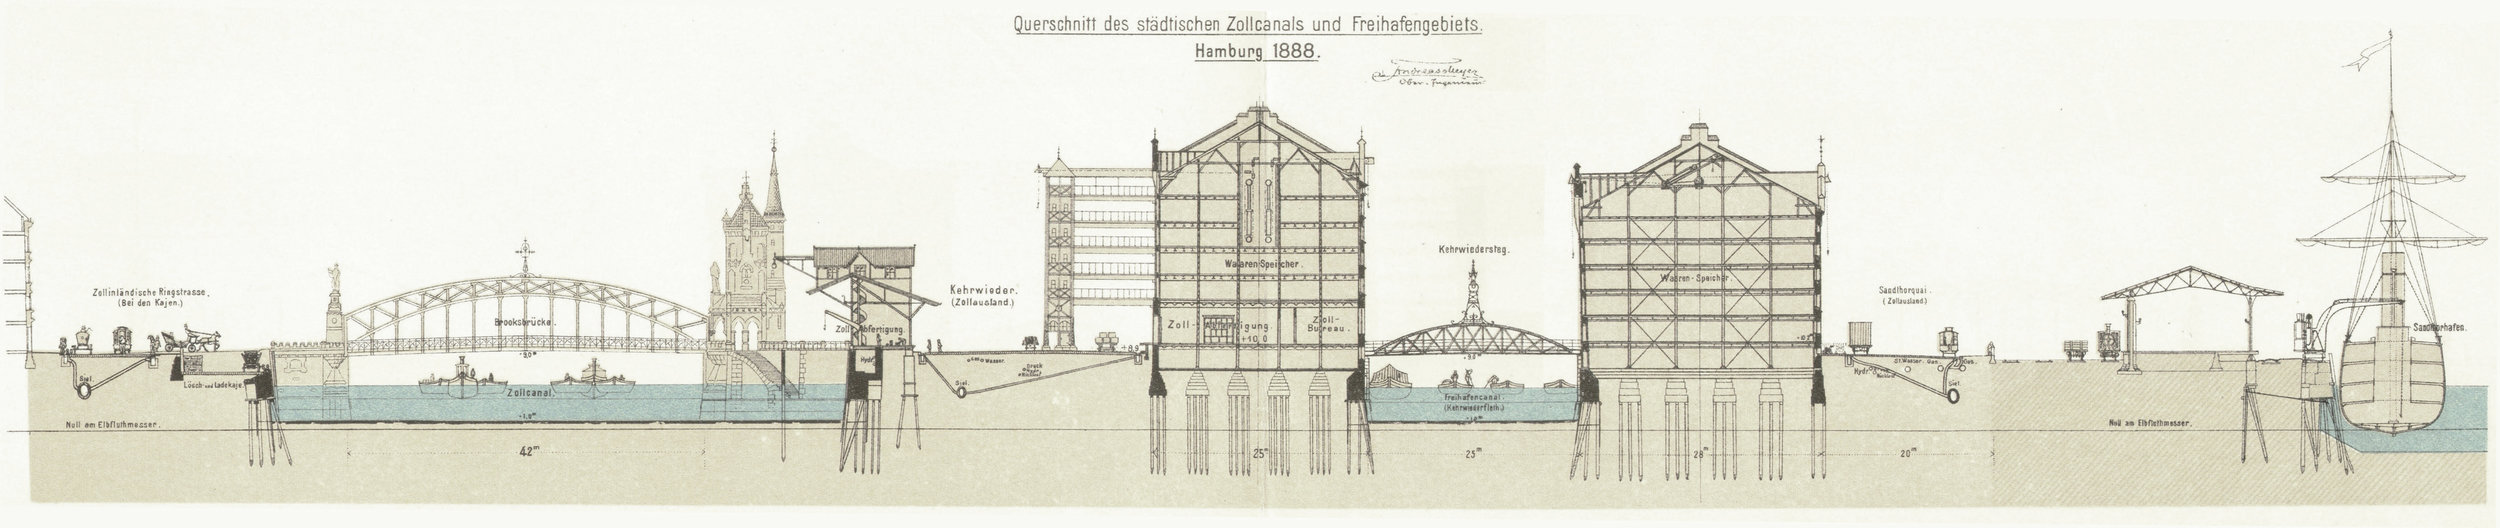 Speicherstadt Section, 1888, image source :de.wikipedia.org/wiki/Franz_Andreas_Meyer